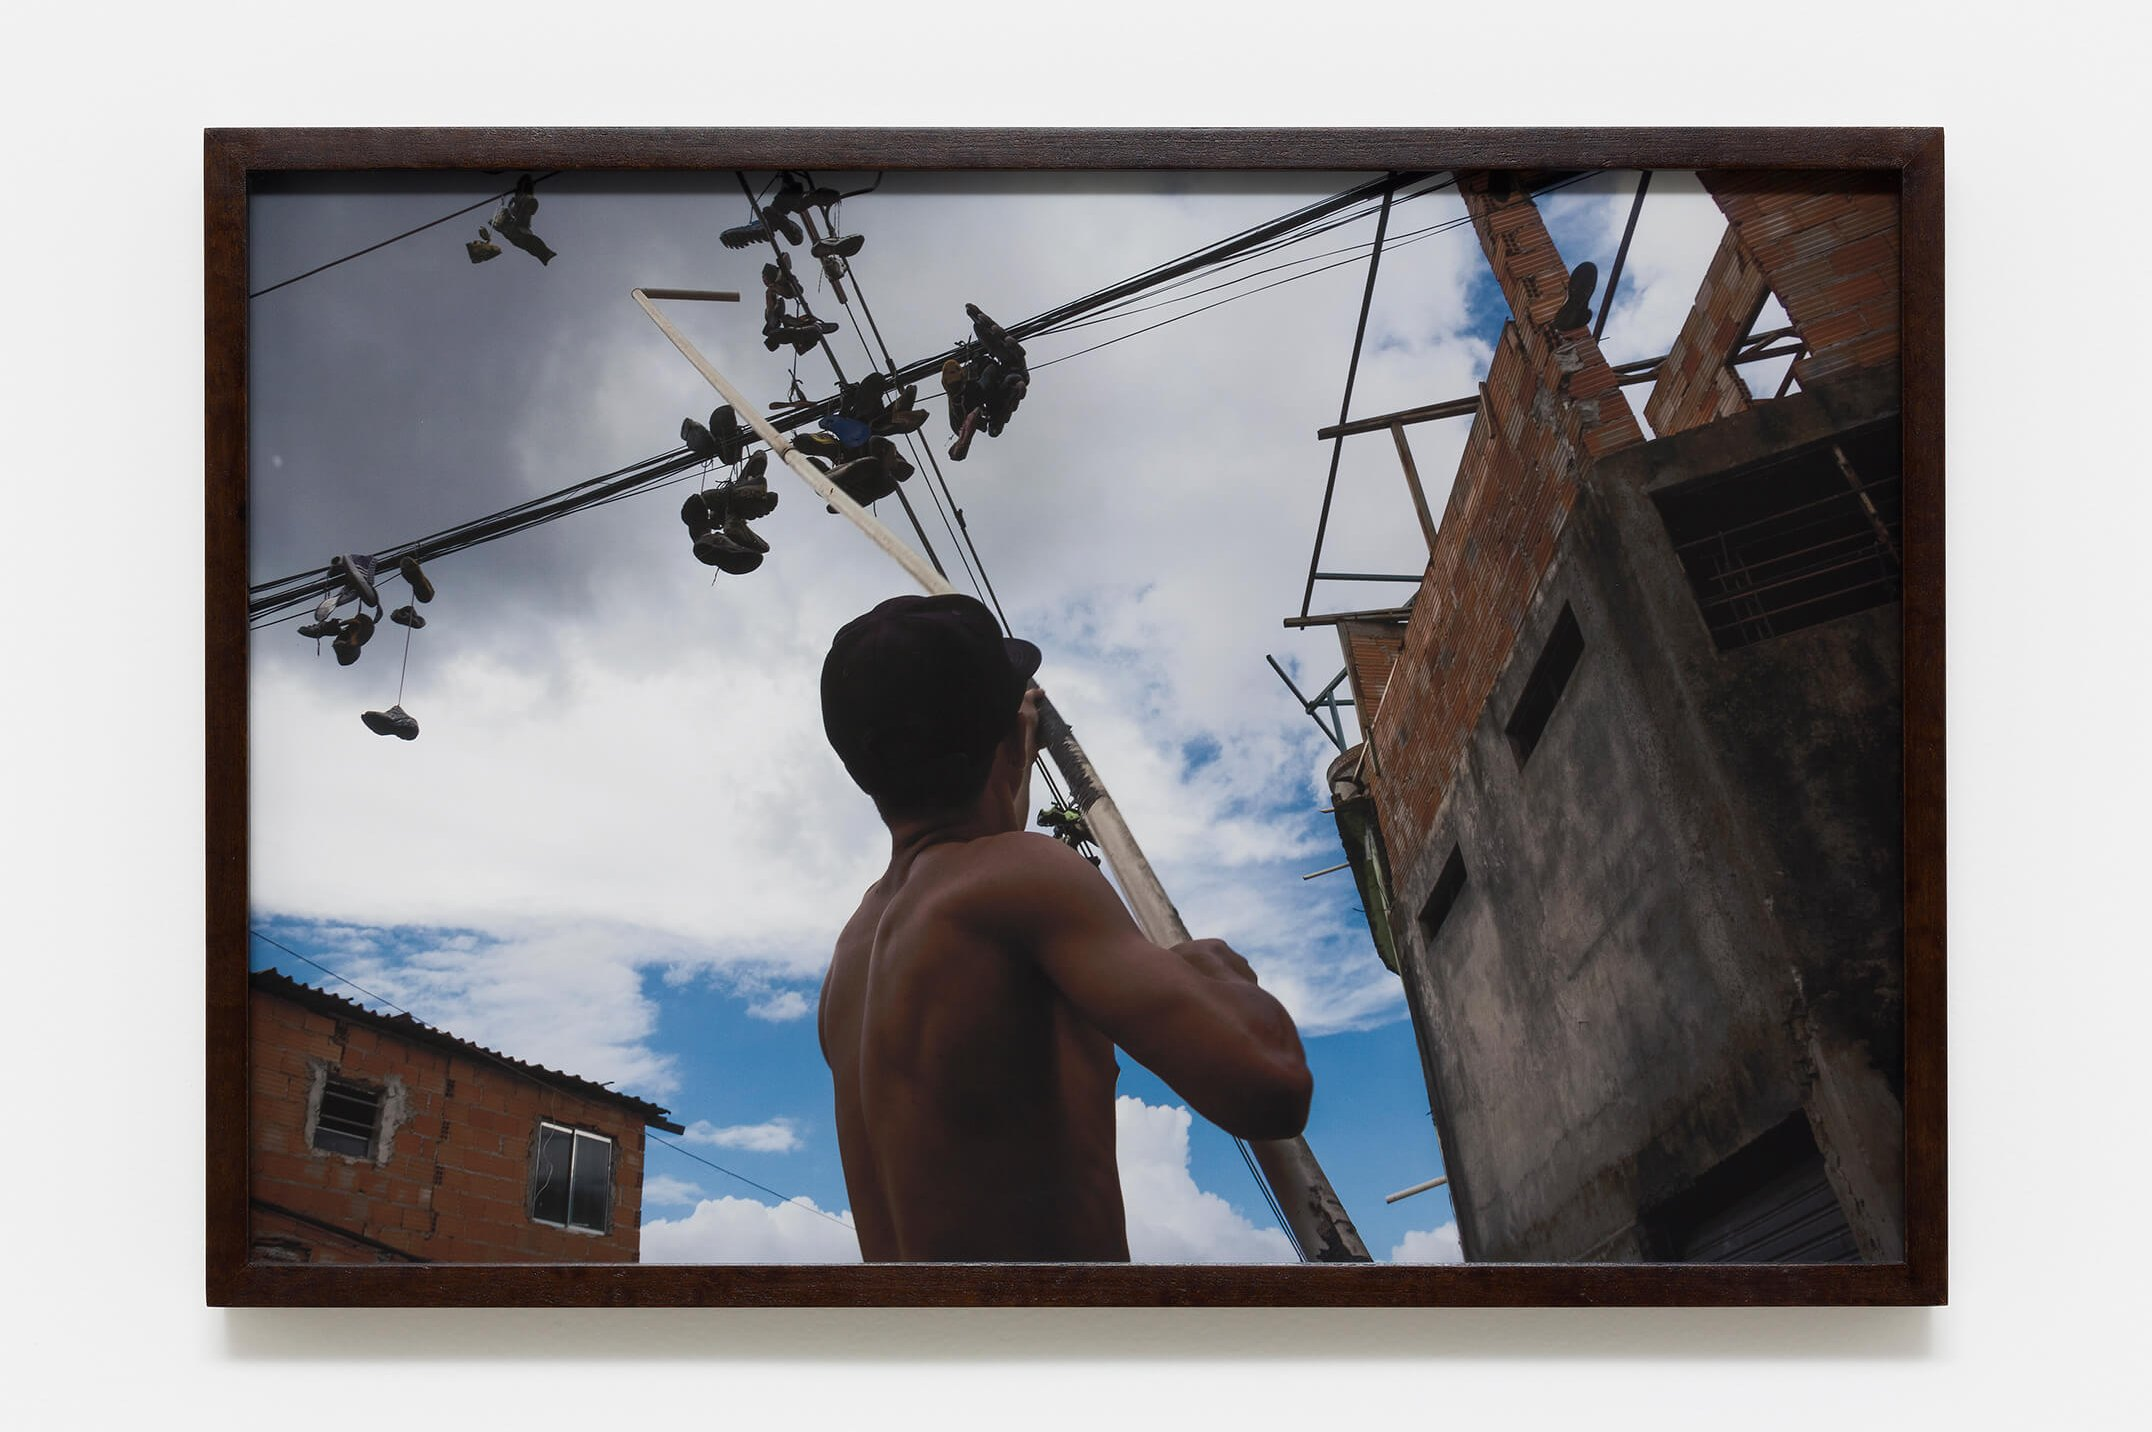 Haroon Gunn-Salie<em>, On the line,</em>2016,print on paper,59,4 × 39,6 cm - Mendes Wood DM